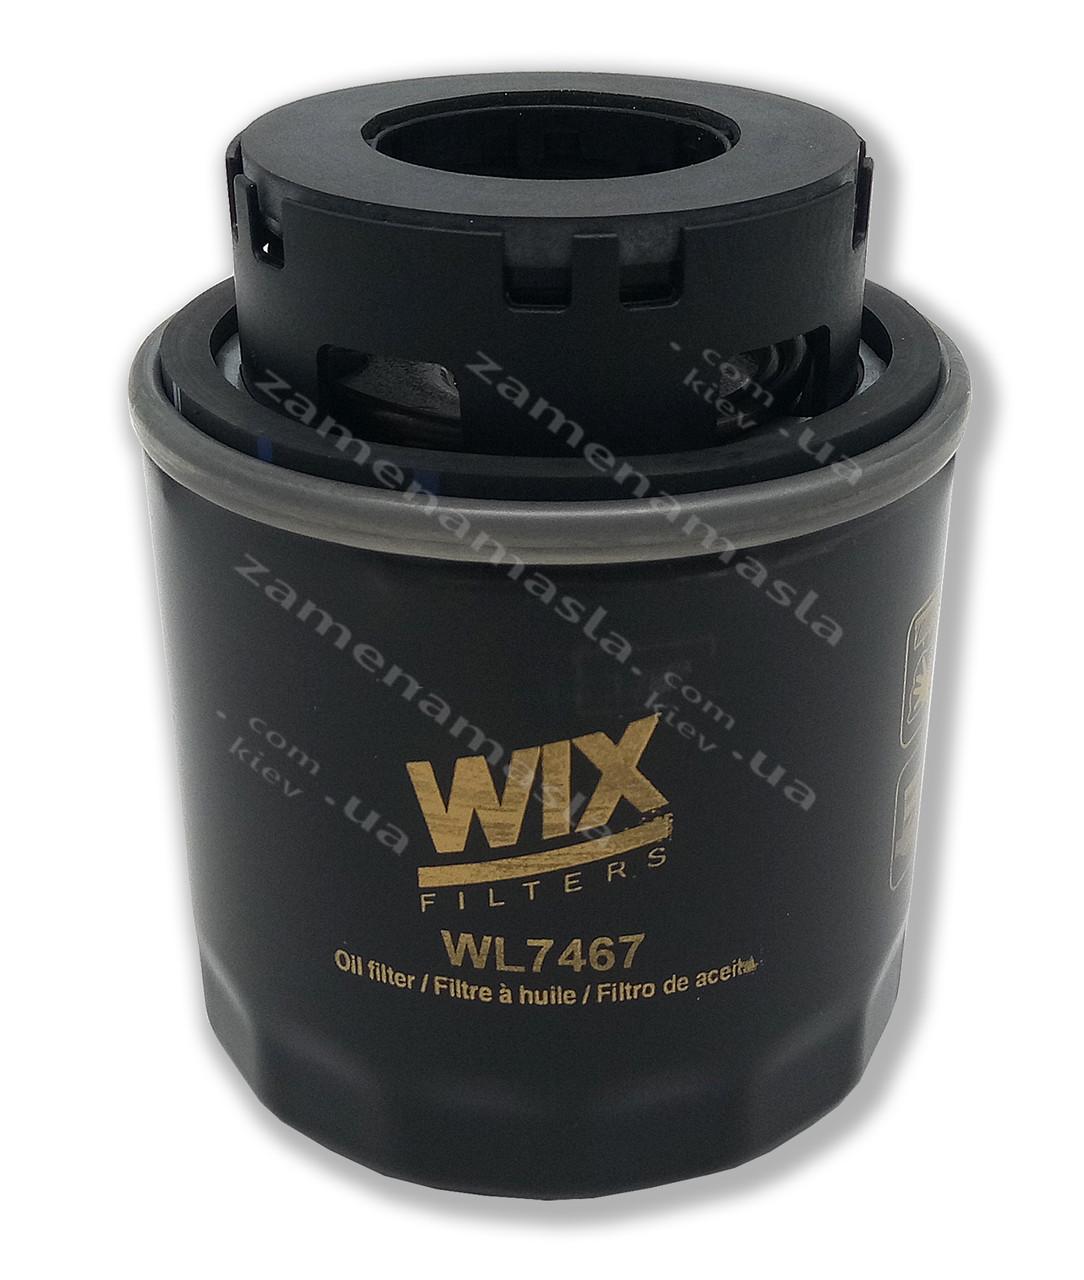 WIX WL7467 аналог SM-5085 на Audi, Skoda, Volkswagen